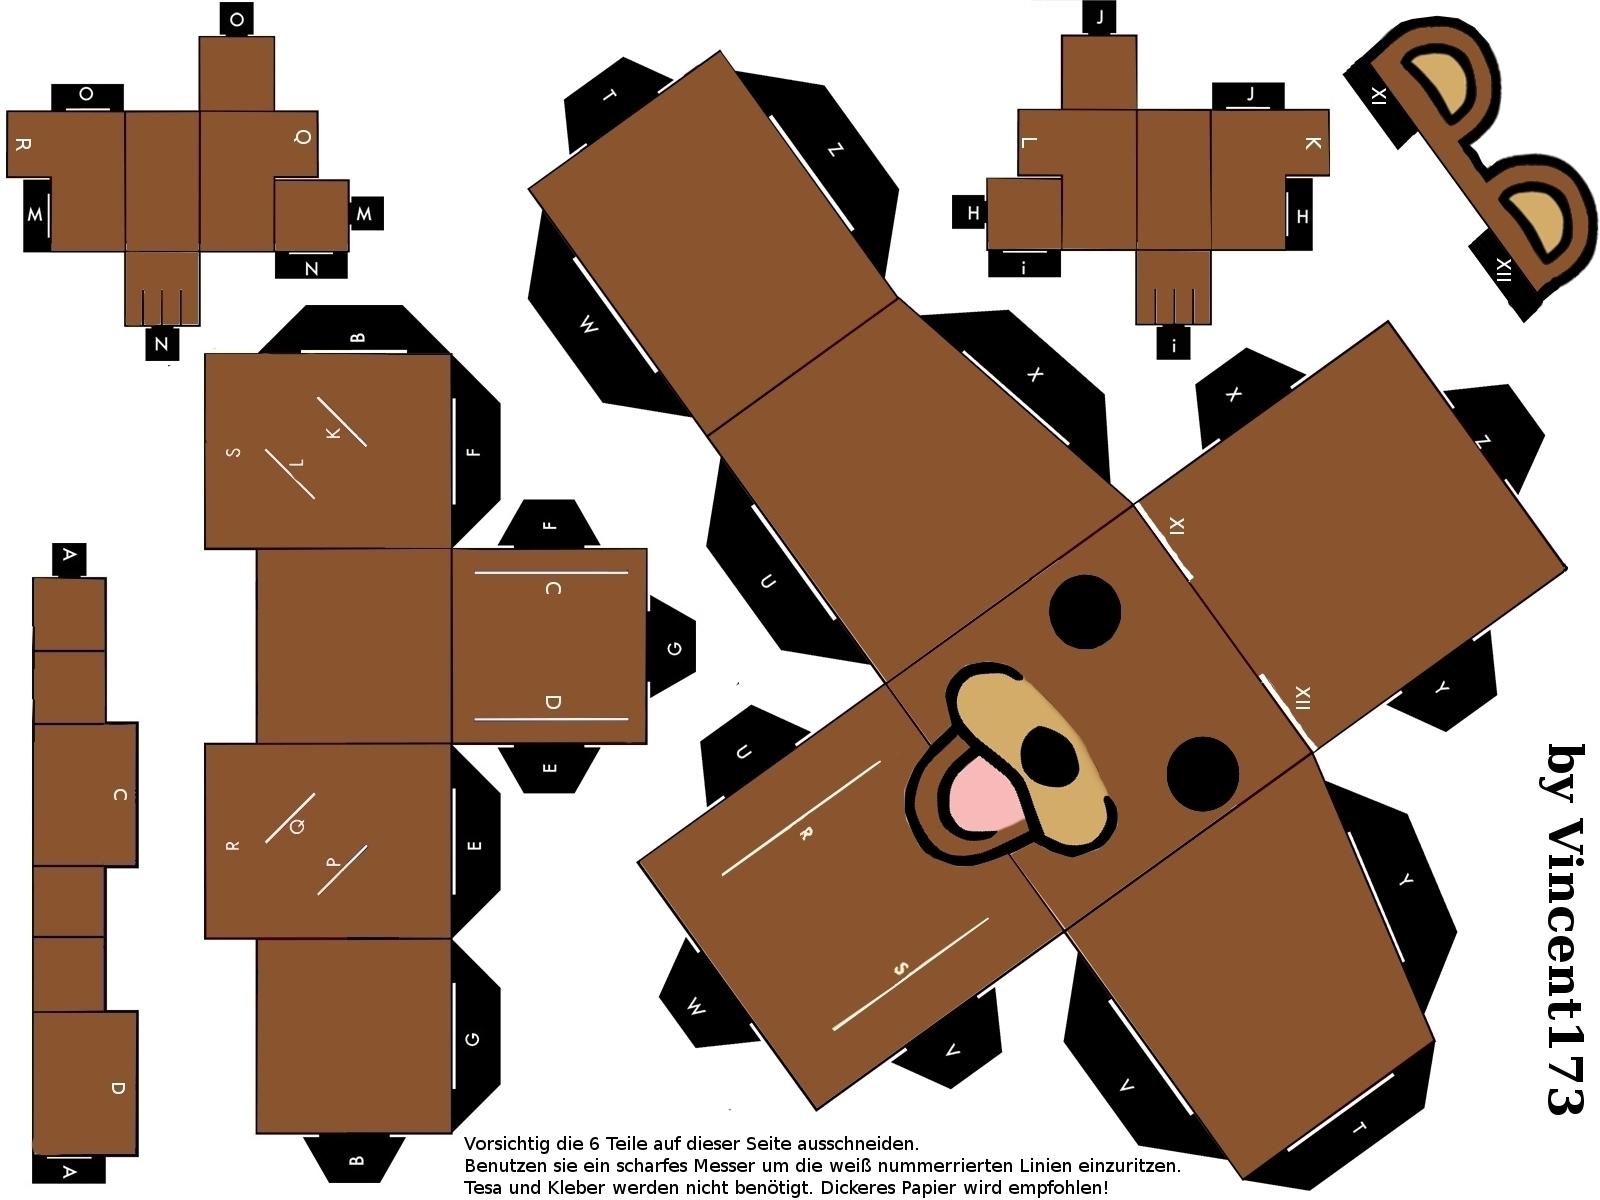 Danbo papercraft a by yuiiwae on deviantart papercraft by ko koneko altavistaventures Choice Image